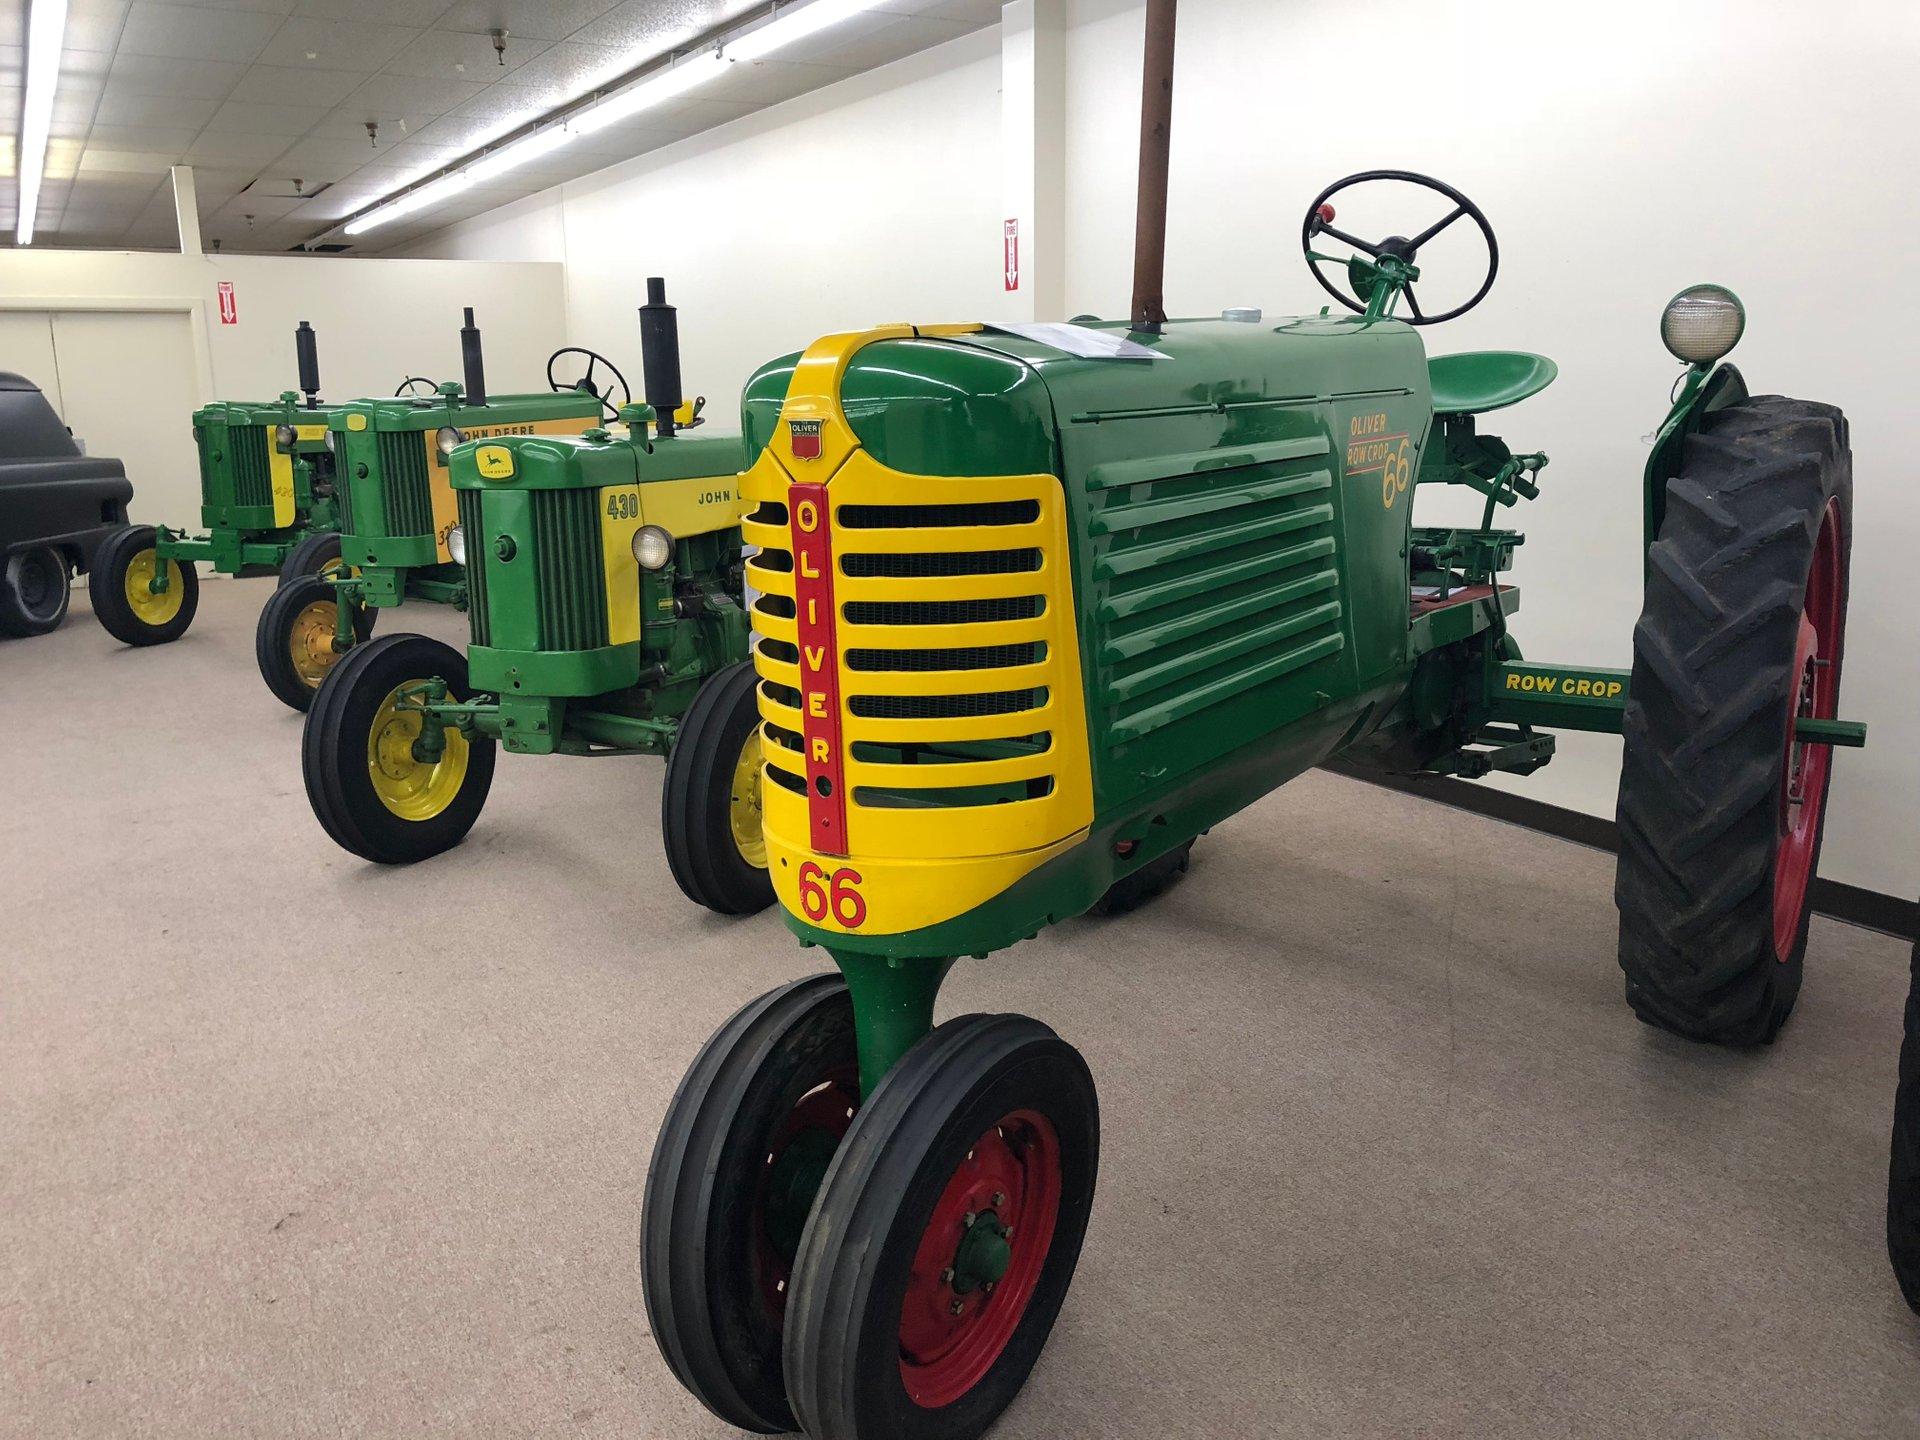 1952 Oliver 66 Row Crop Tractor